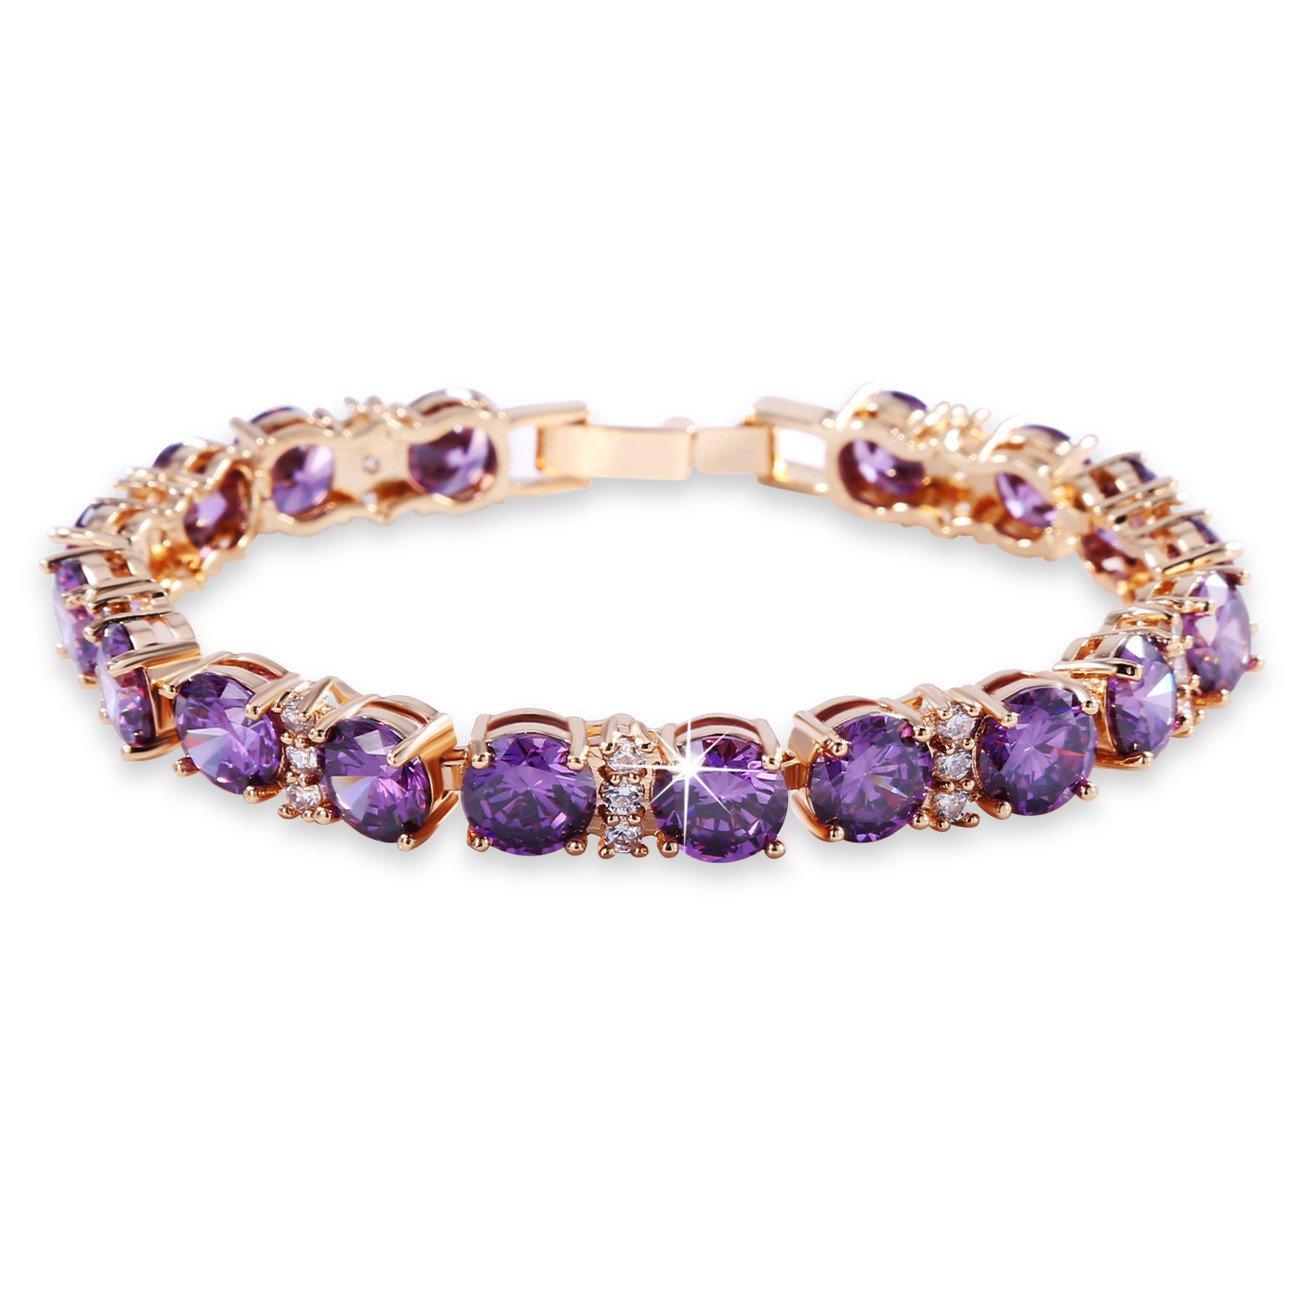 GULICX Ladies Swarovski Element Crystal Tennis Tennis Bracelets Purple Gold Plated for Women Girls